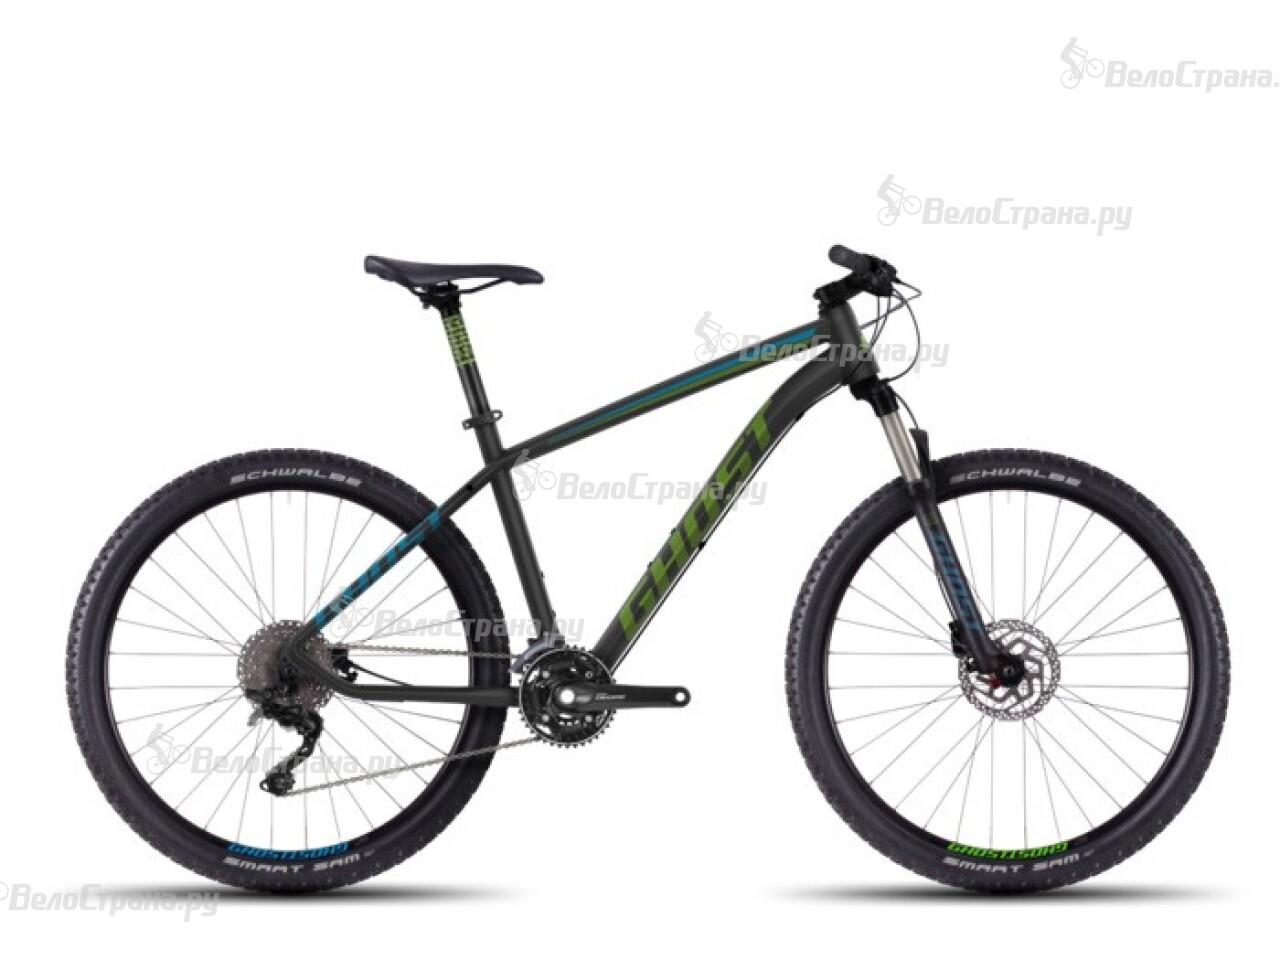 Велосипед Ghost Kato 5 (2016) цены онлайн